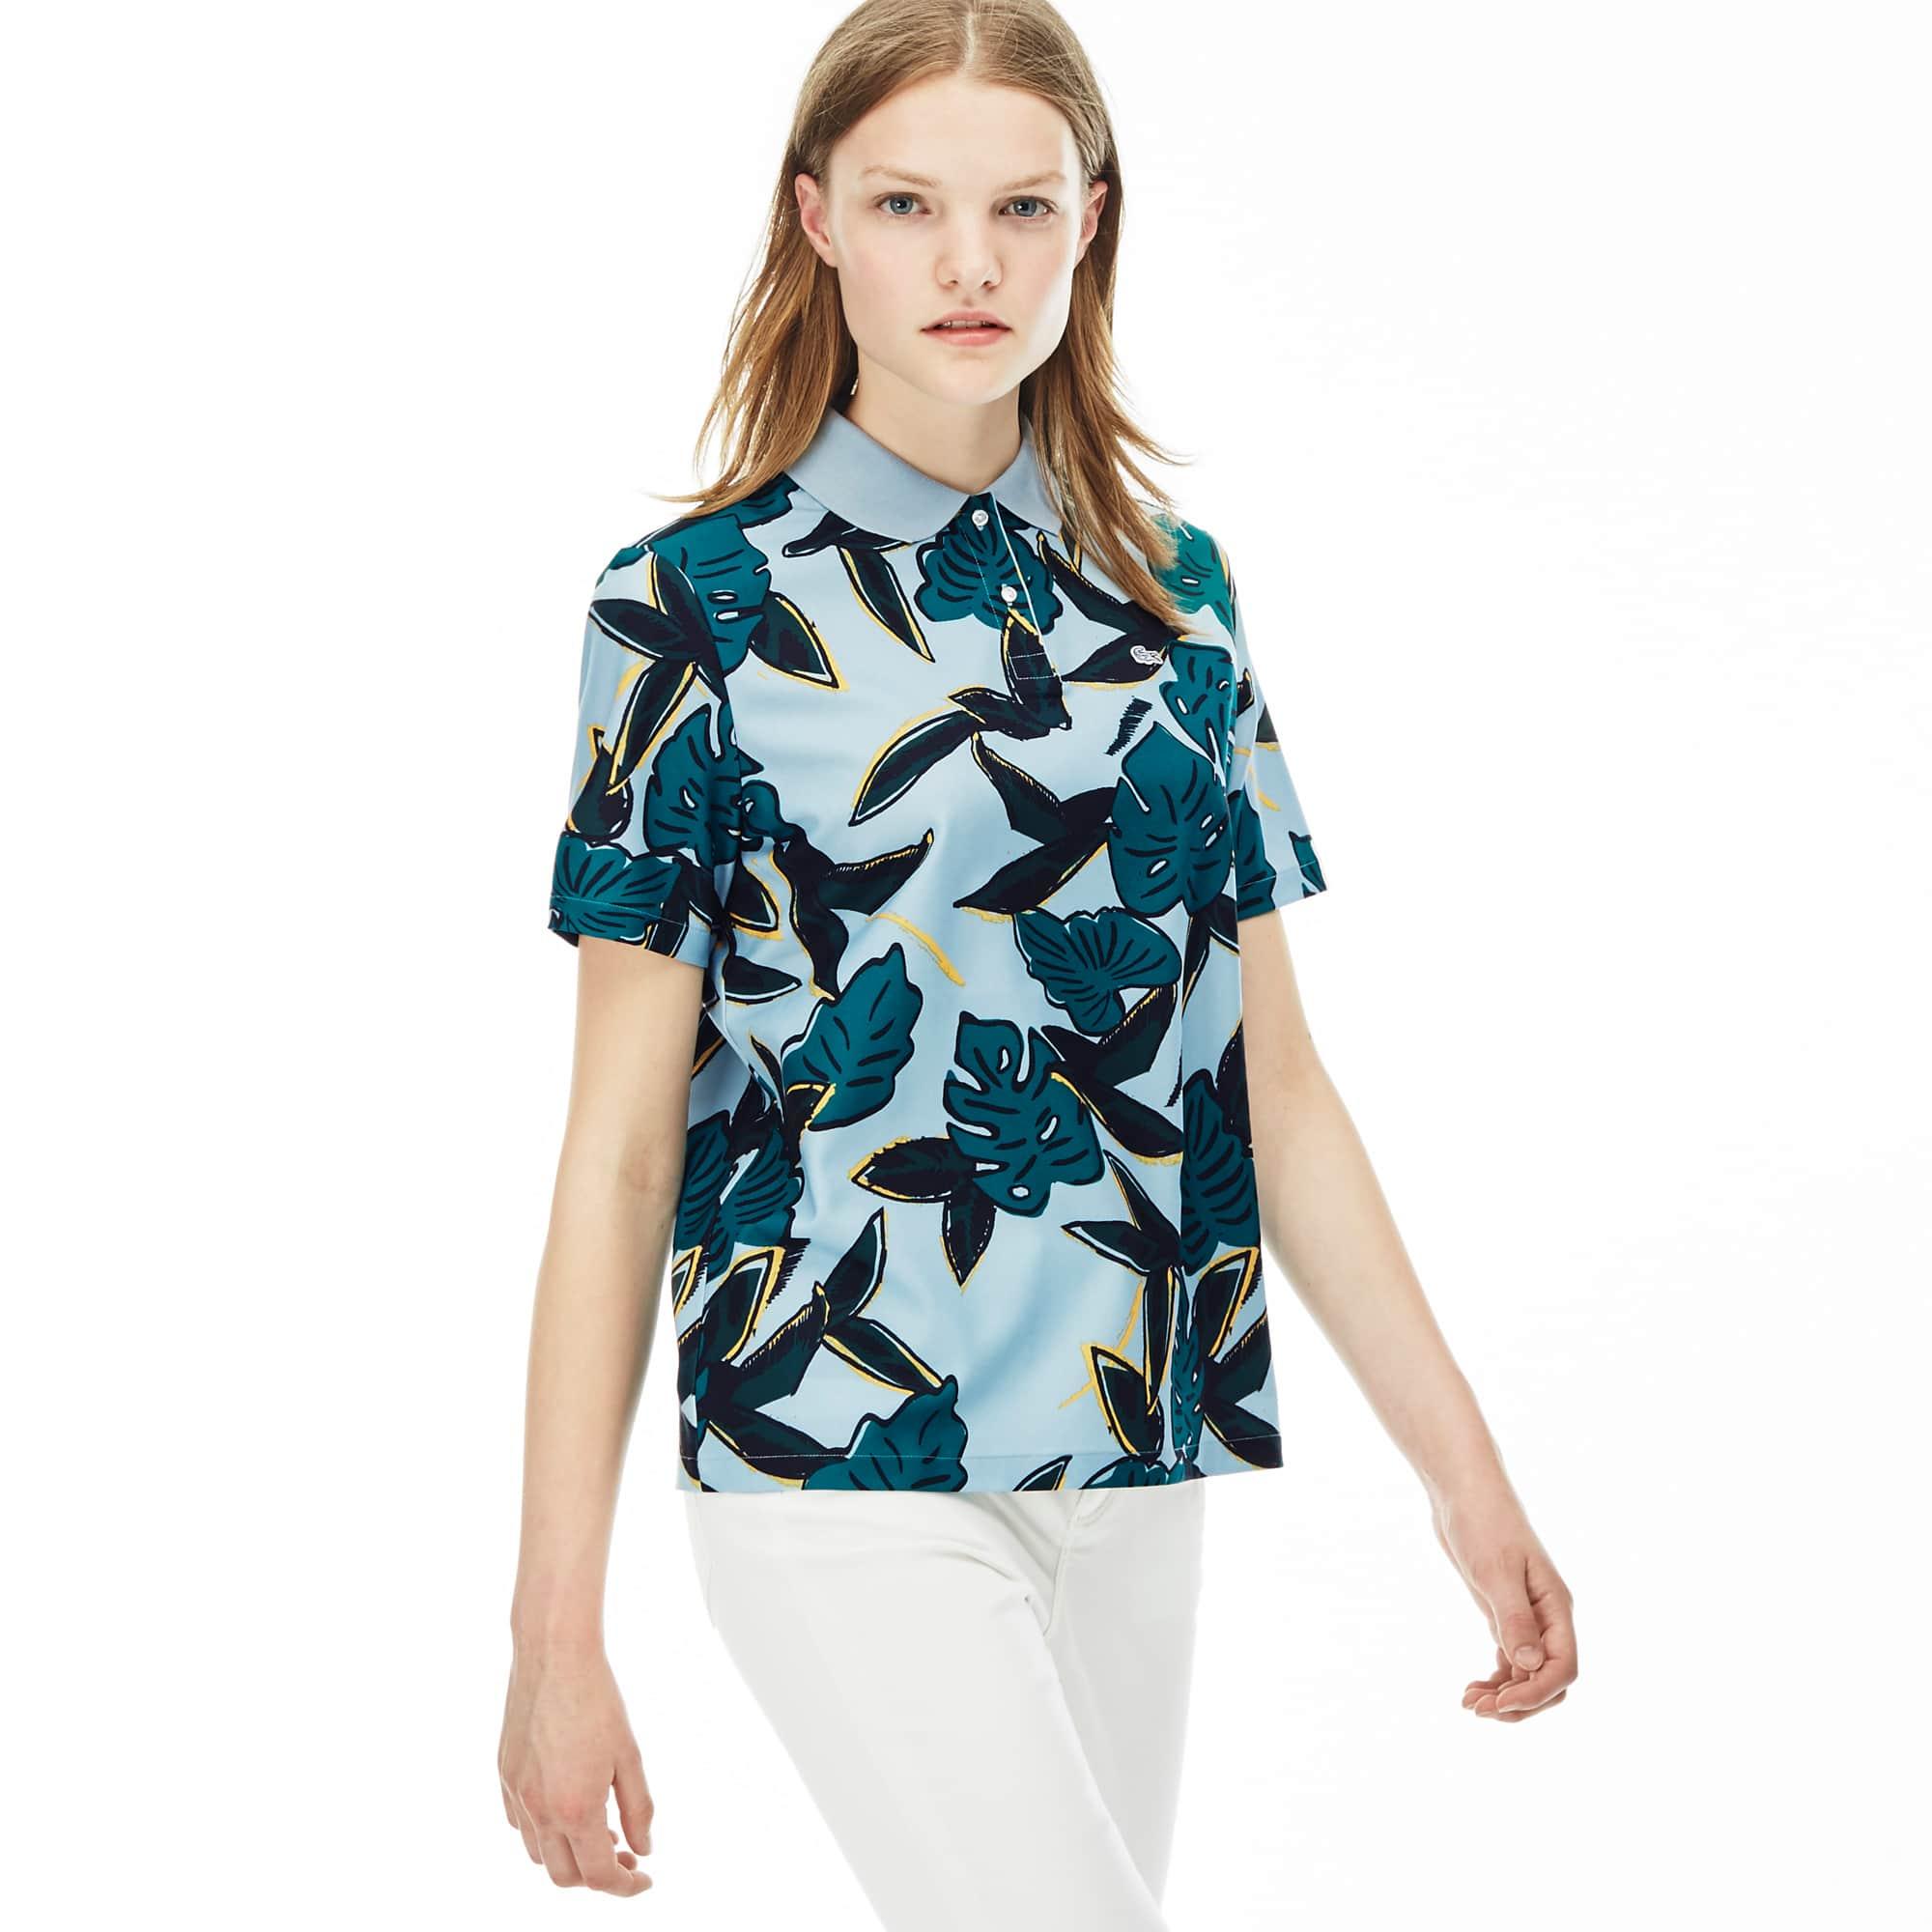 b1aba3a51a 100+ Hawaiian Polo Shirt For Women HD Wallpapers – My Sweet Home